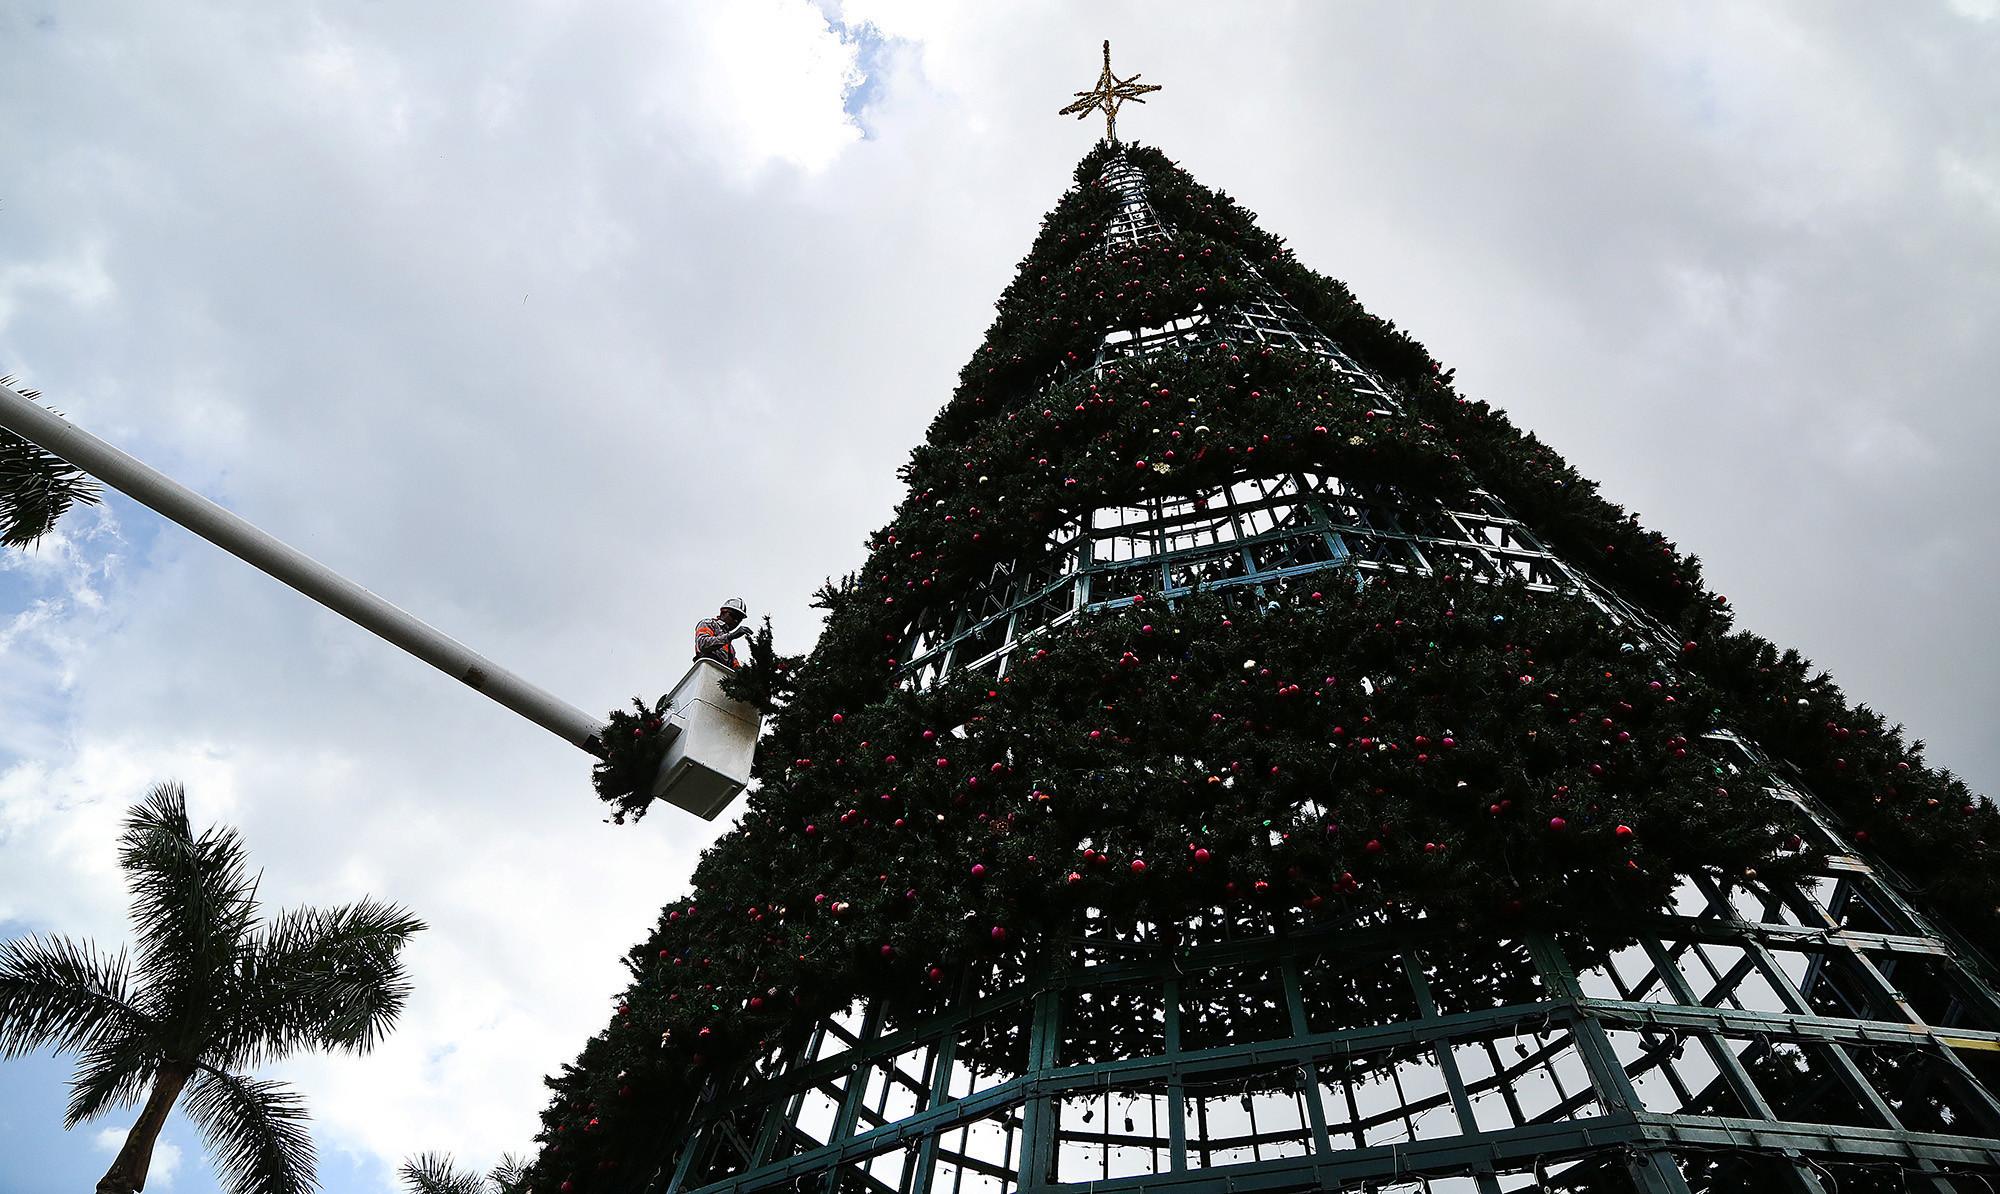 Delray kicks off monthlong holiday activities with tree lighting